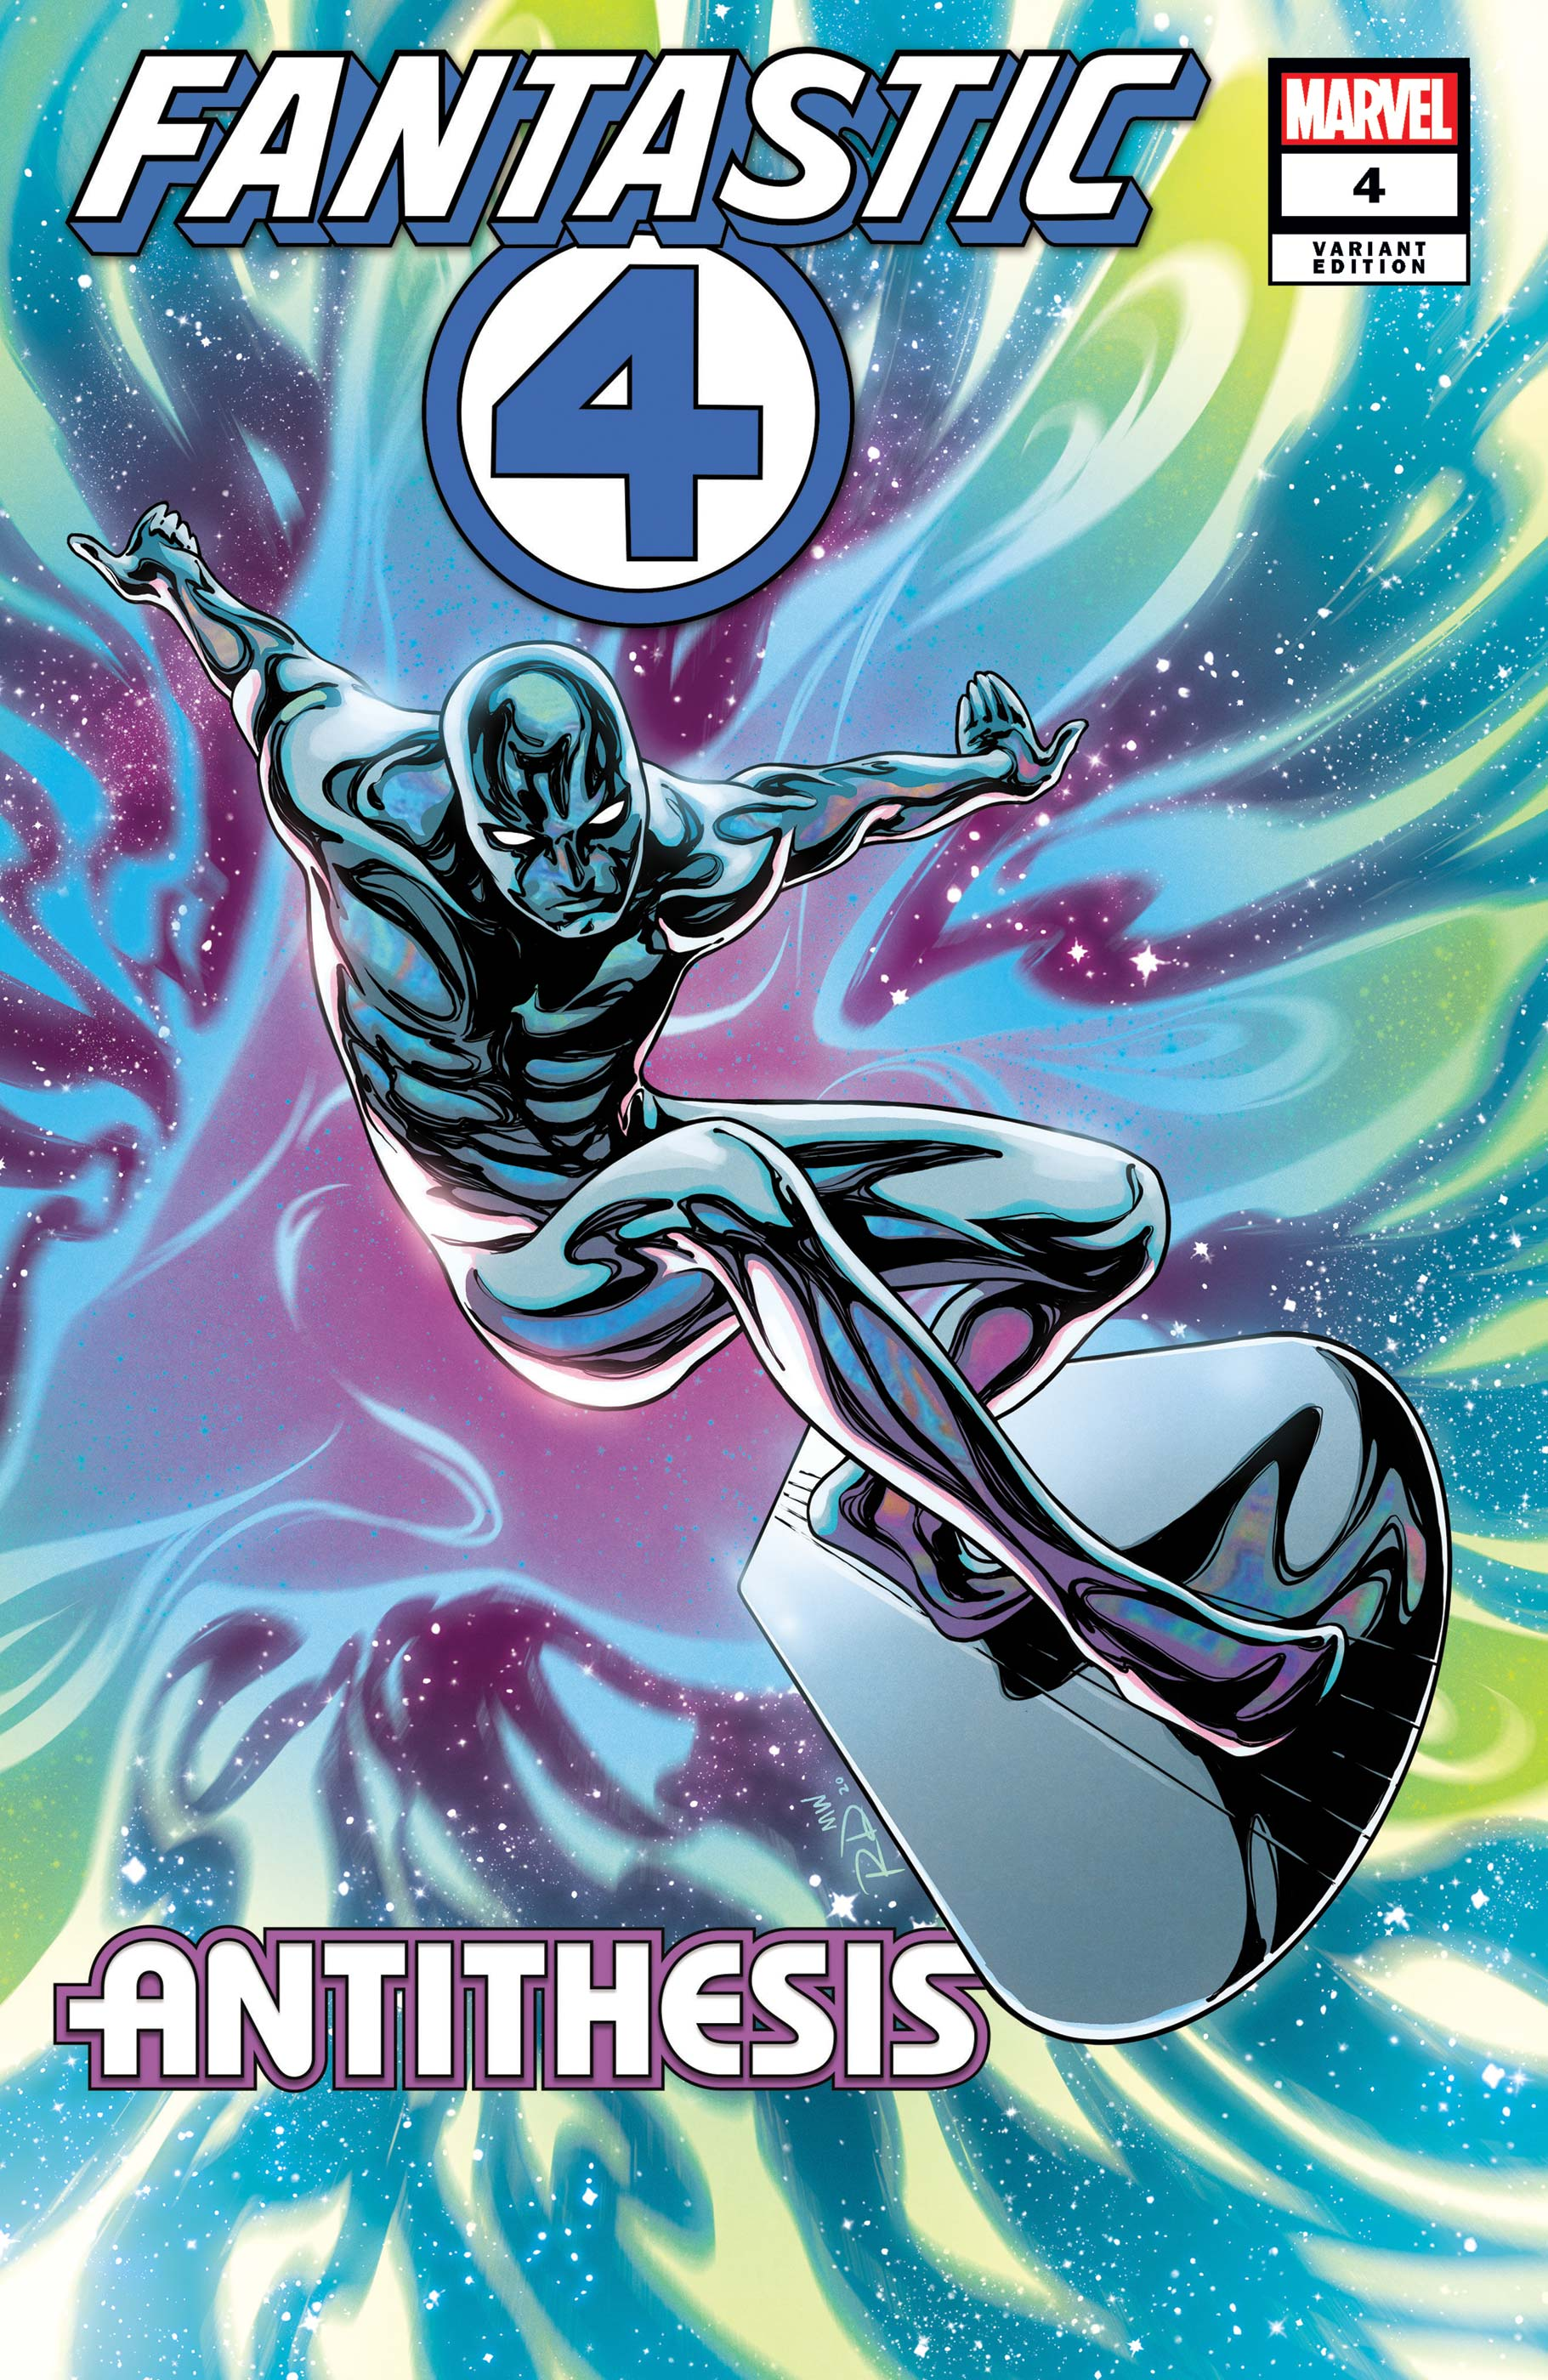 Fantastic Four: Antithesis (2020) #4 (Variant)